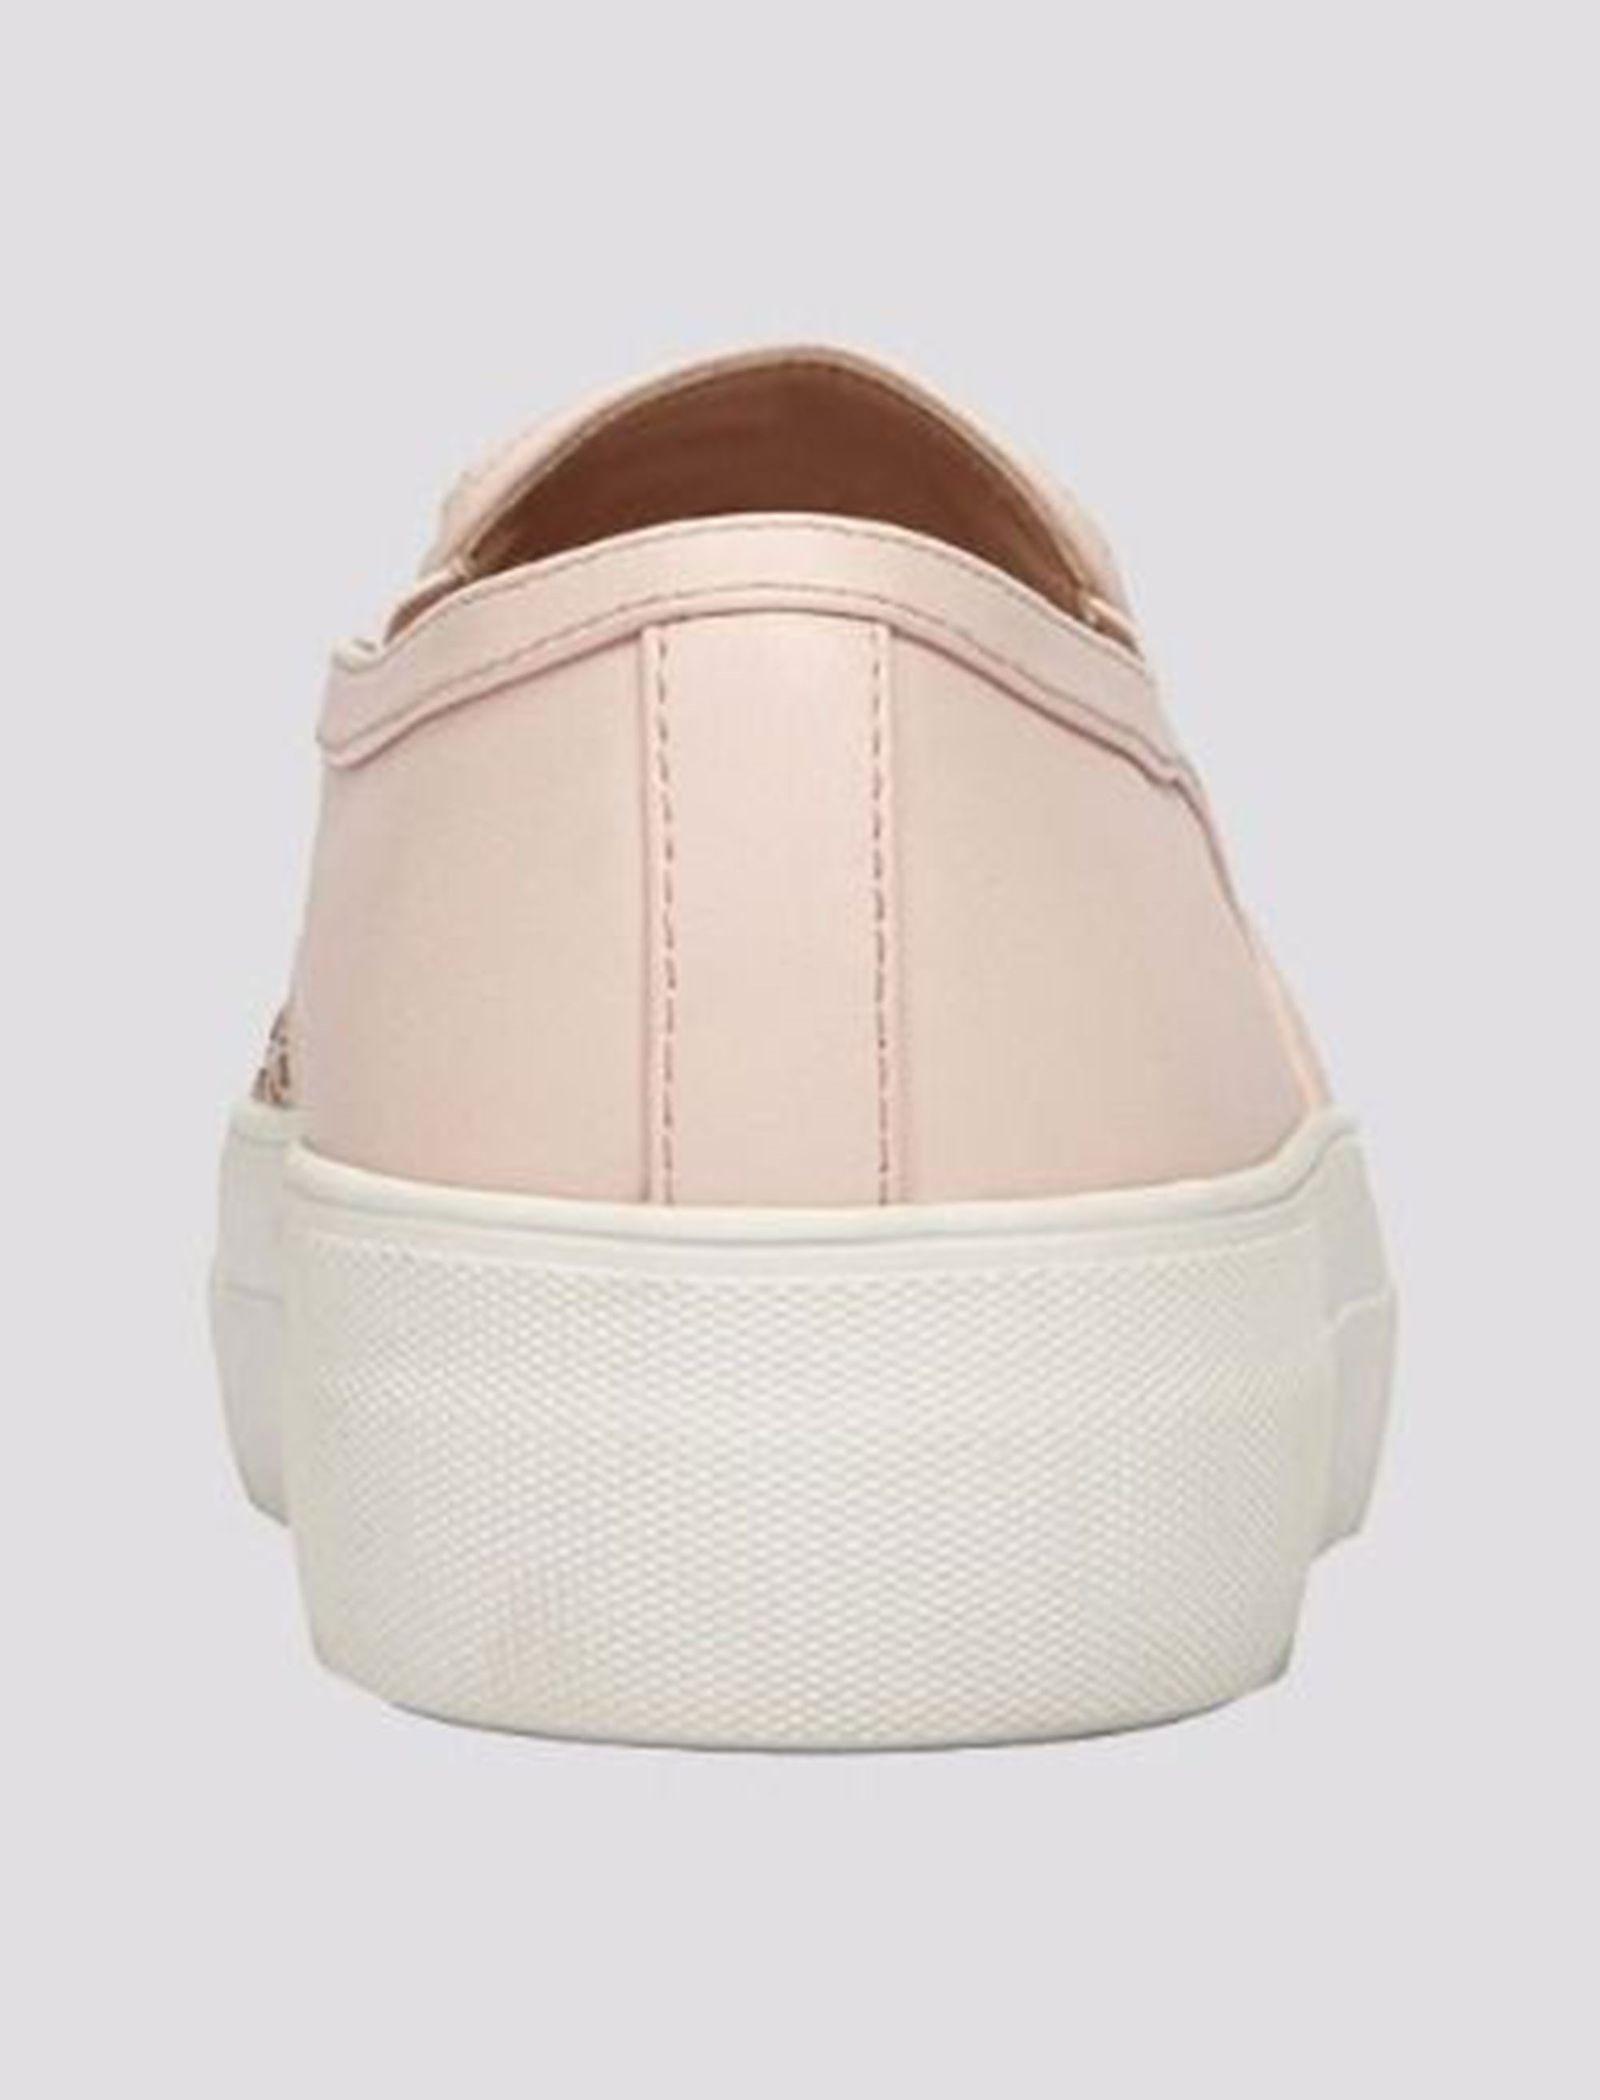 کفش لژ دار زنانه - کال ایت اسپرینگ - صورتي - 3